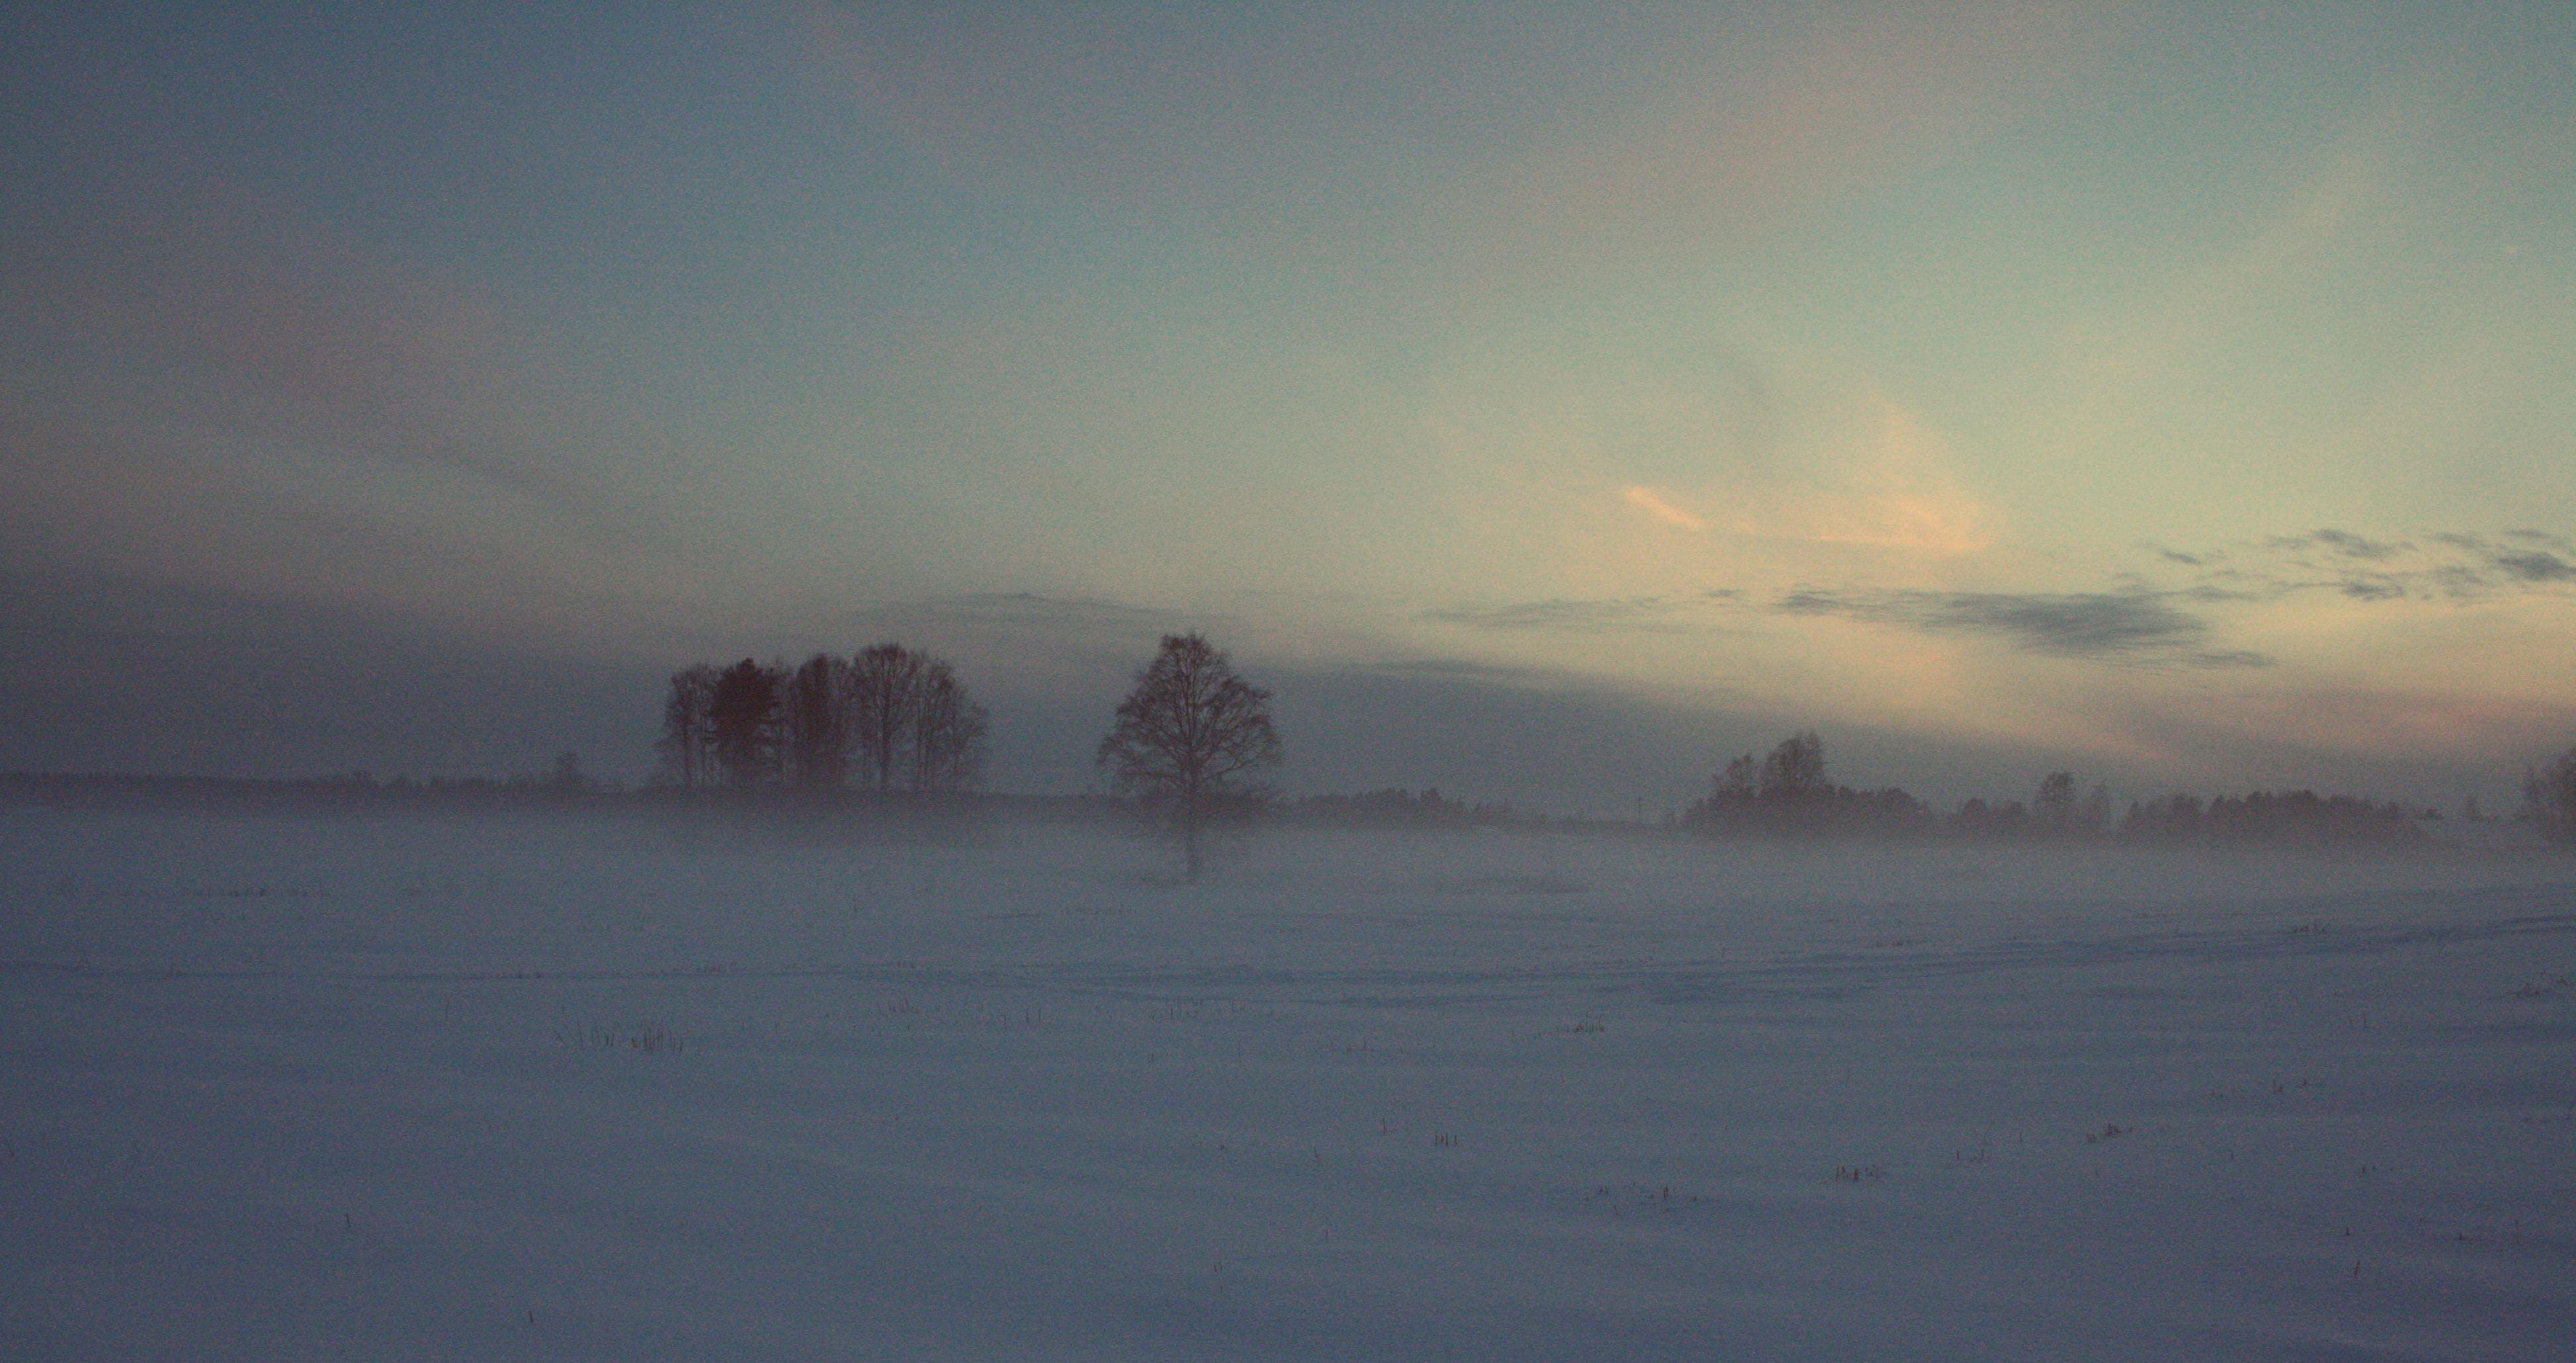 Free stock photo of #winter #nature #snow #fog